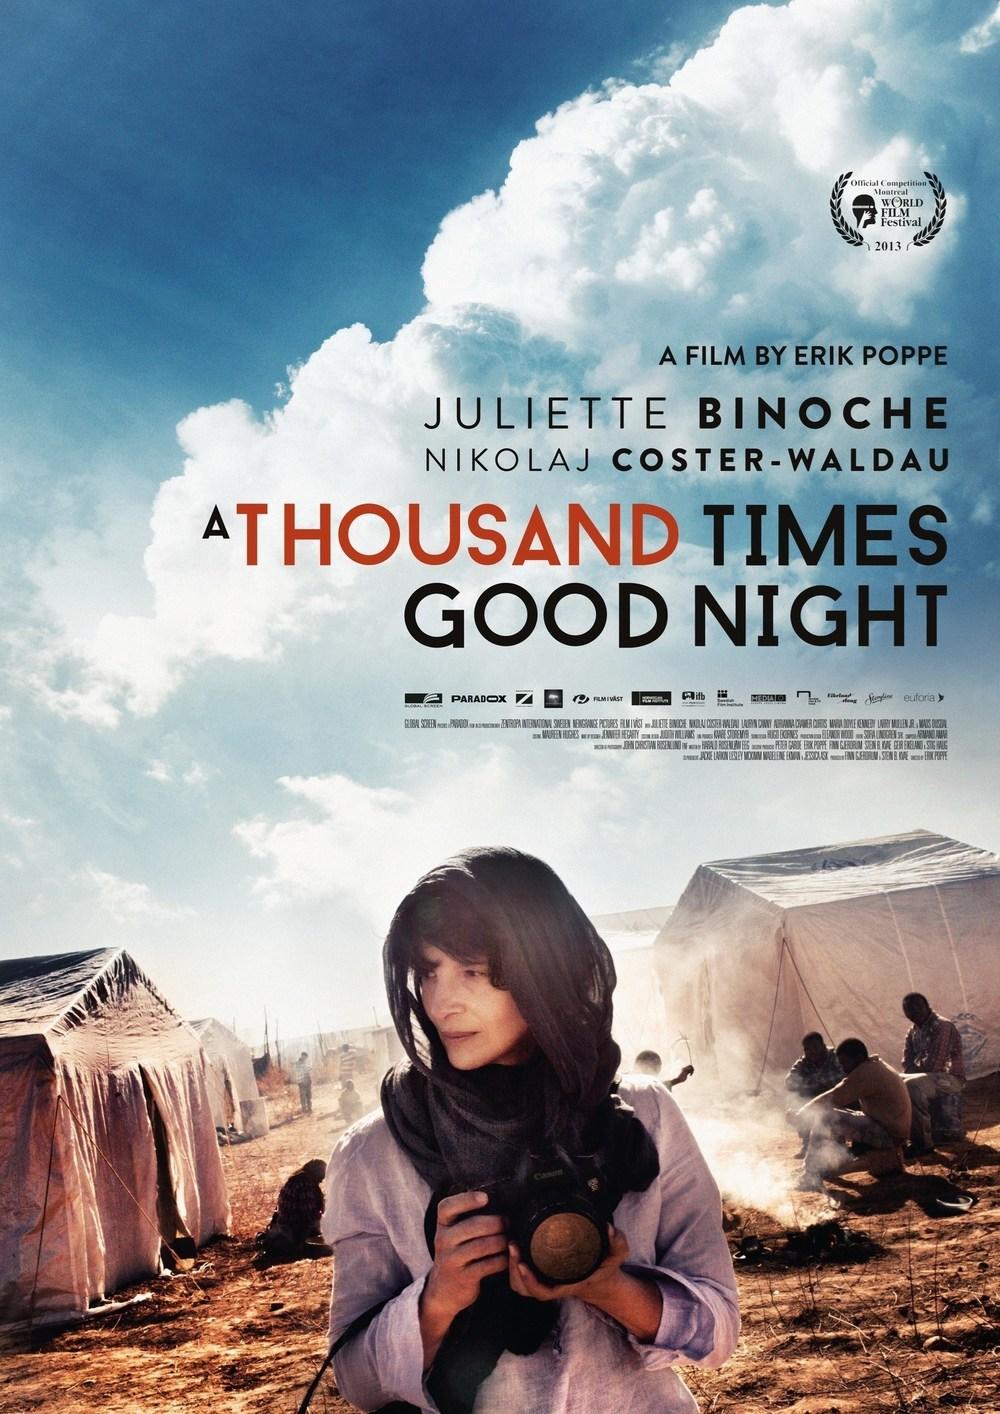 tusen-ganger-god-natt-a-thousand-times-good-night.21160.jpg